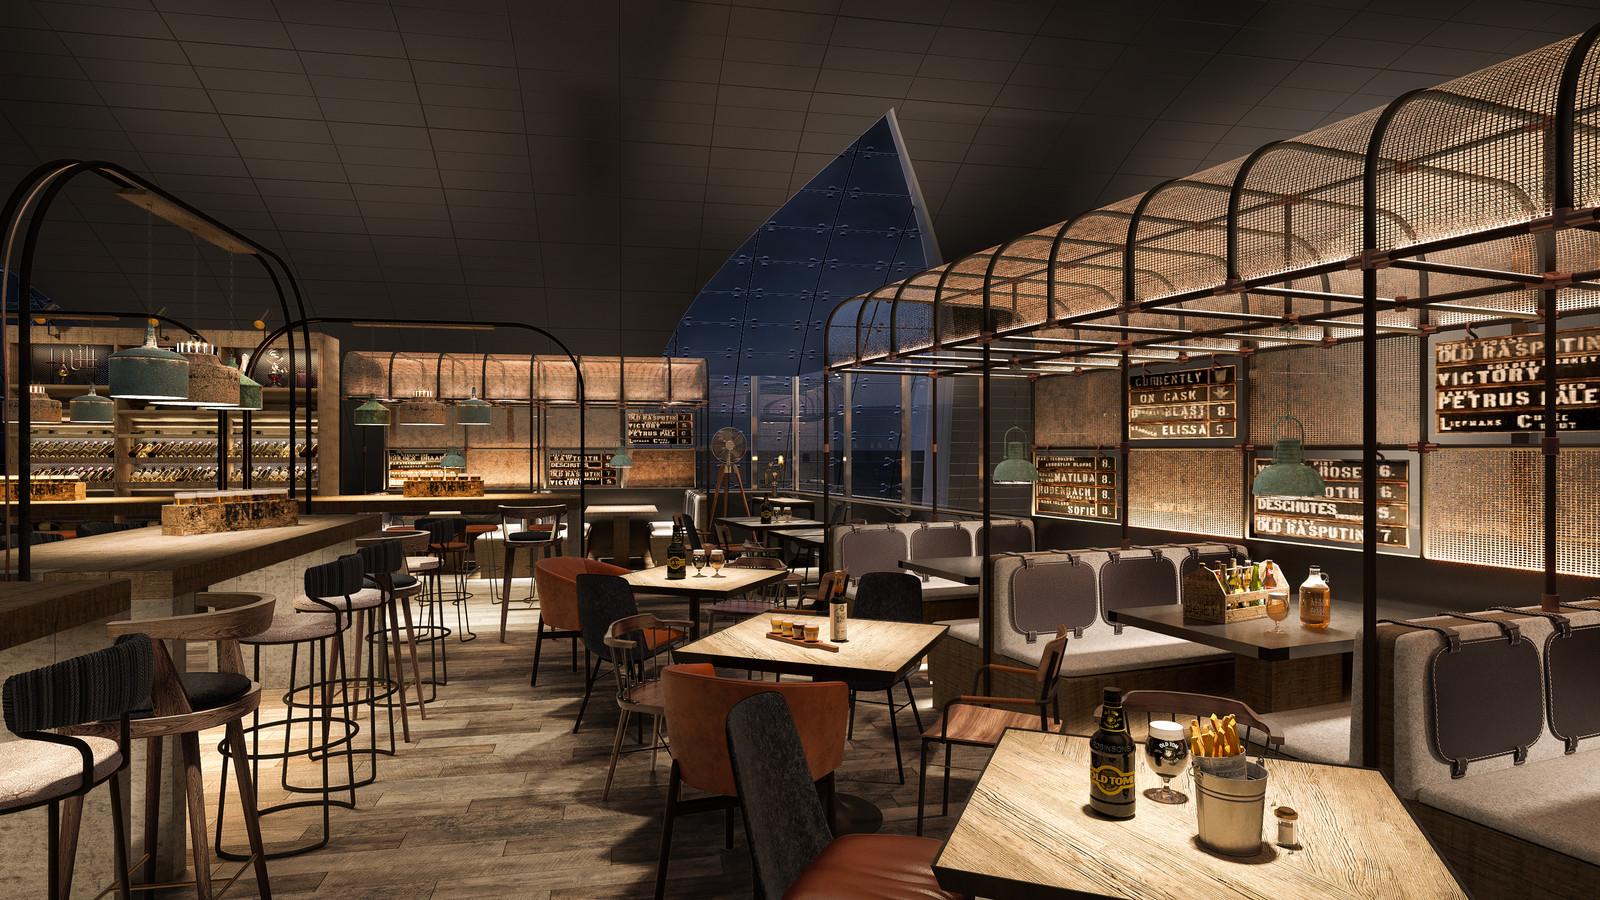 Airport Craft Beer Bar | Architectural And Interior Design CGIs | UK |  Framed Visualisation